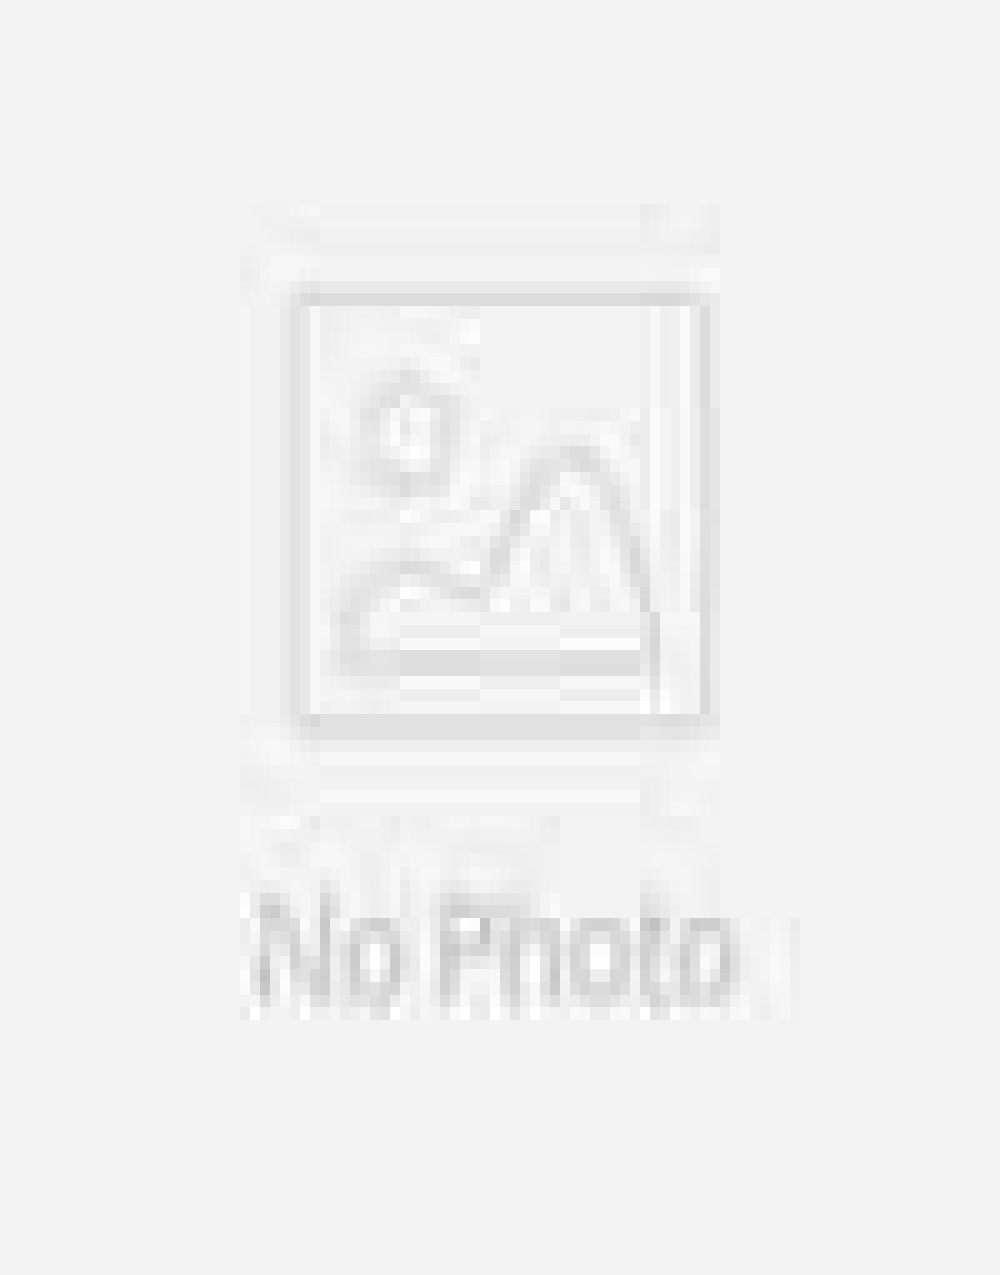 Fashion Oval Gem Hairband Tiara Hair Accessories Head Chain Fashion Hair Jewelry Decorations For Hair 2015(China (Mainland))